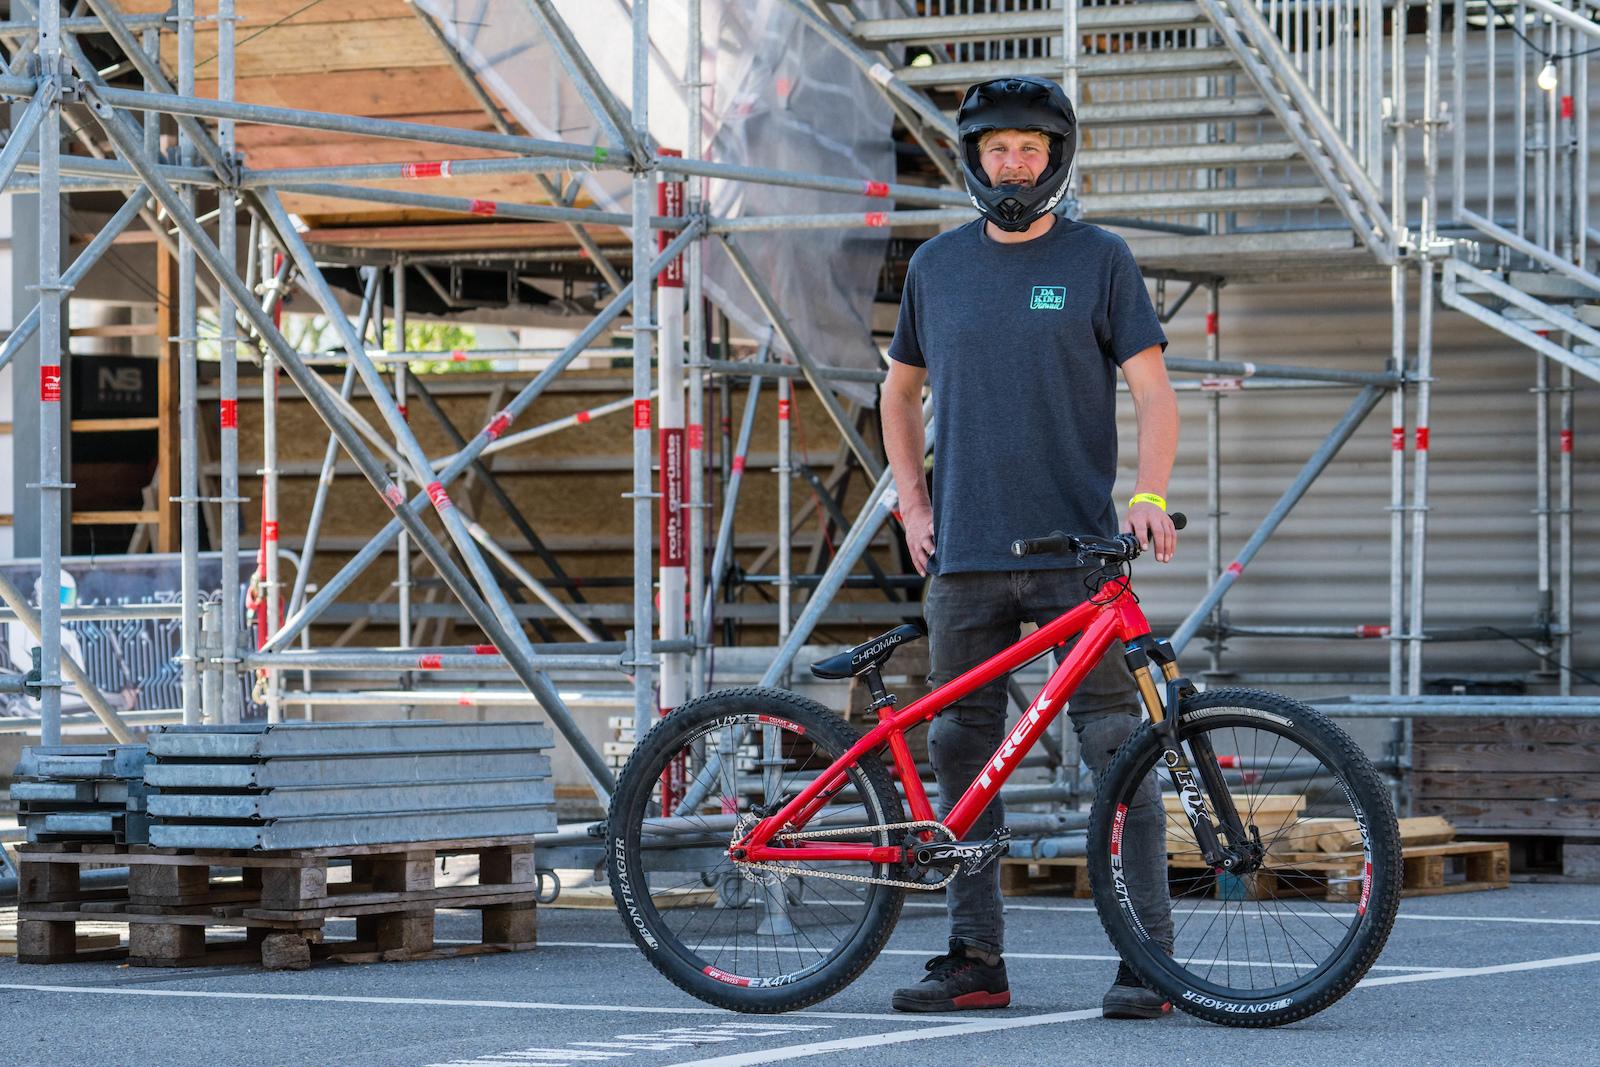 12 Dirt Jump Bikes From Rocket Air Pinkbike